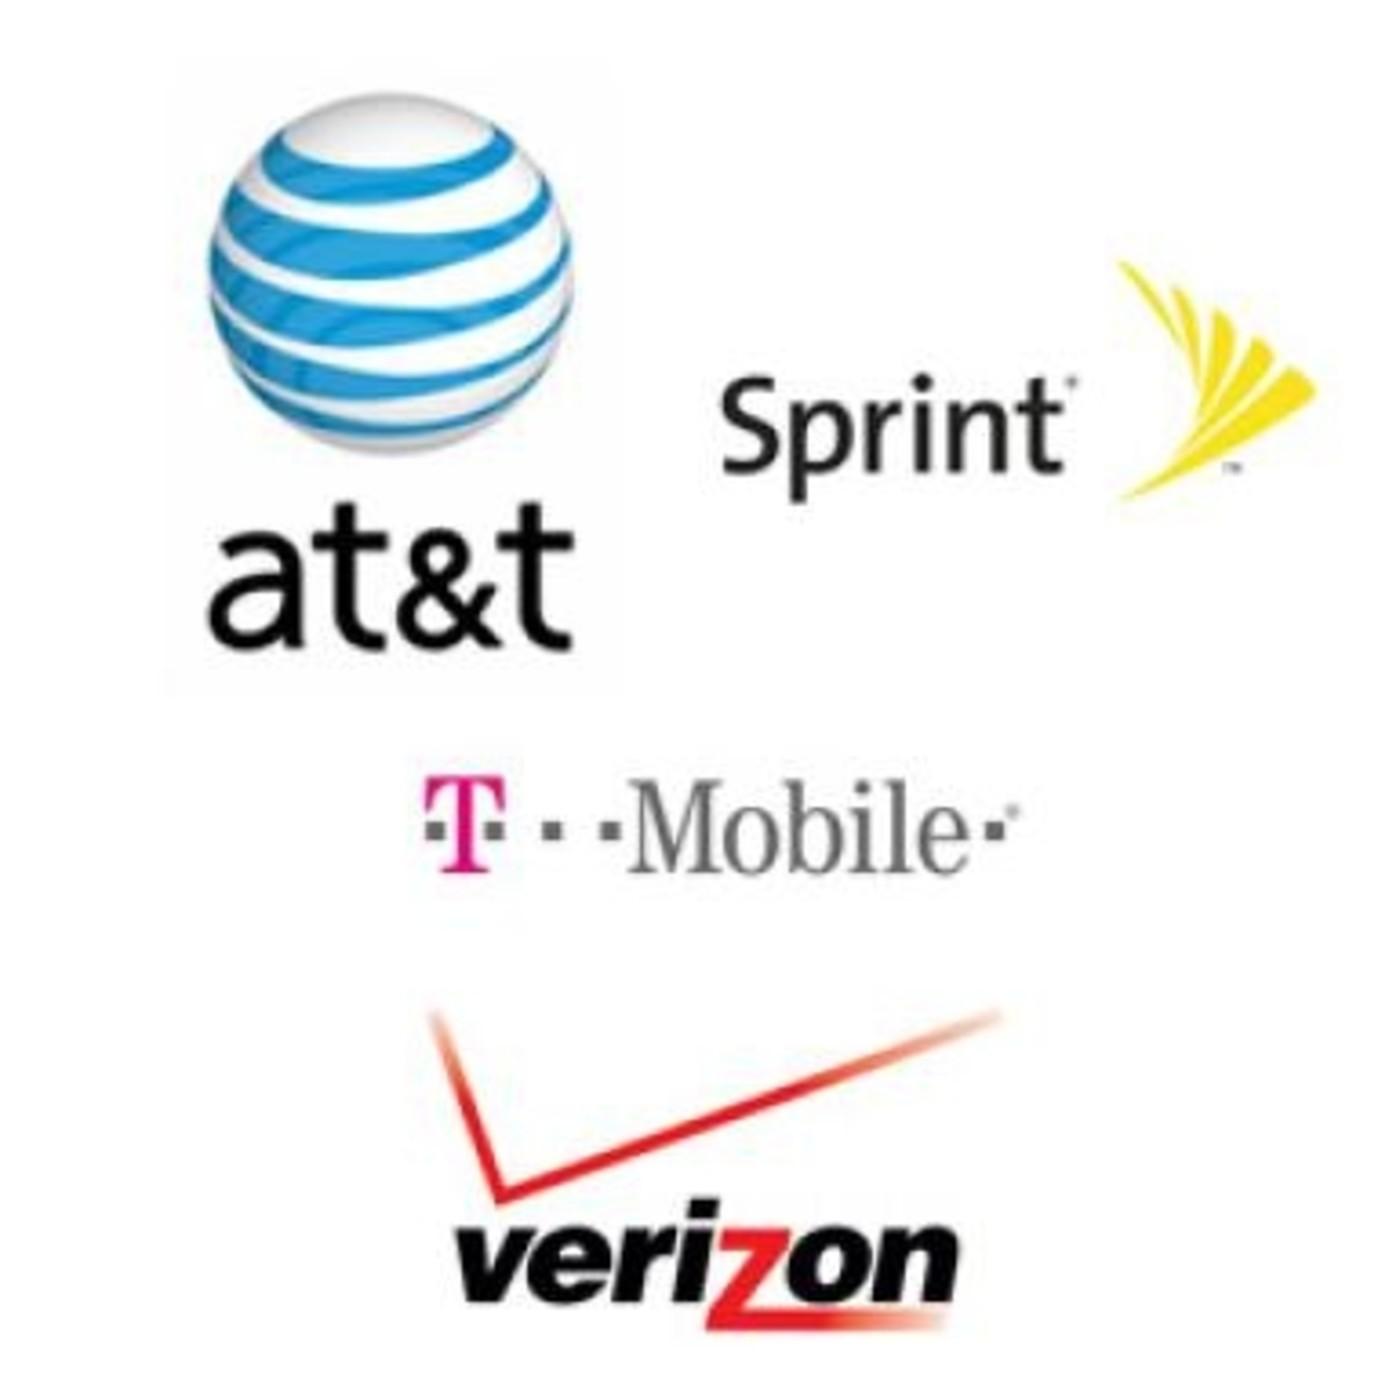 KEEP 2x03 Telefonia en EE. UU. cambio de tarifas